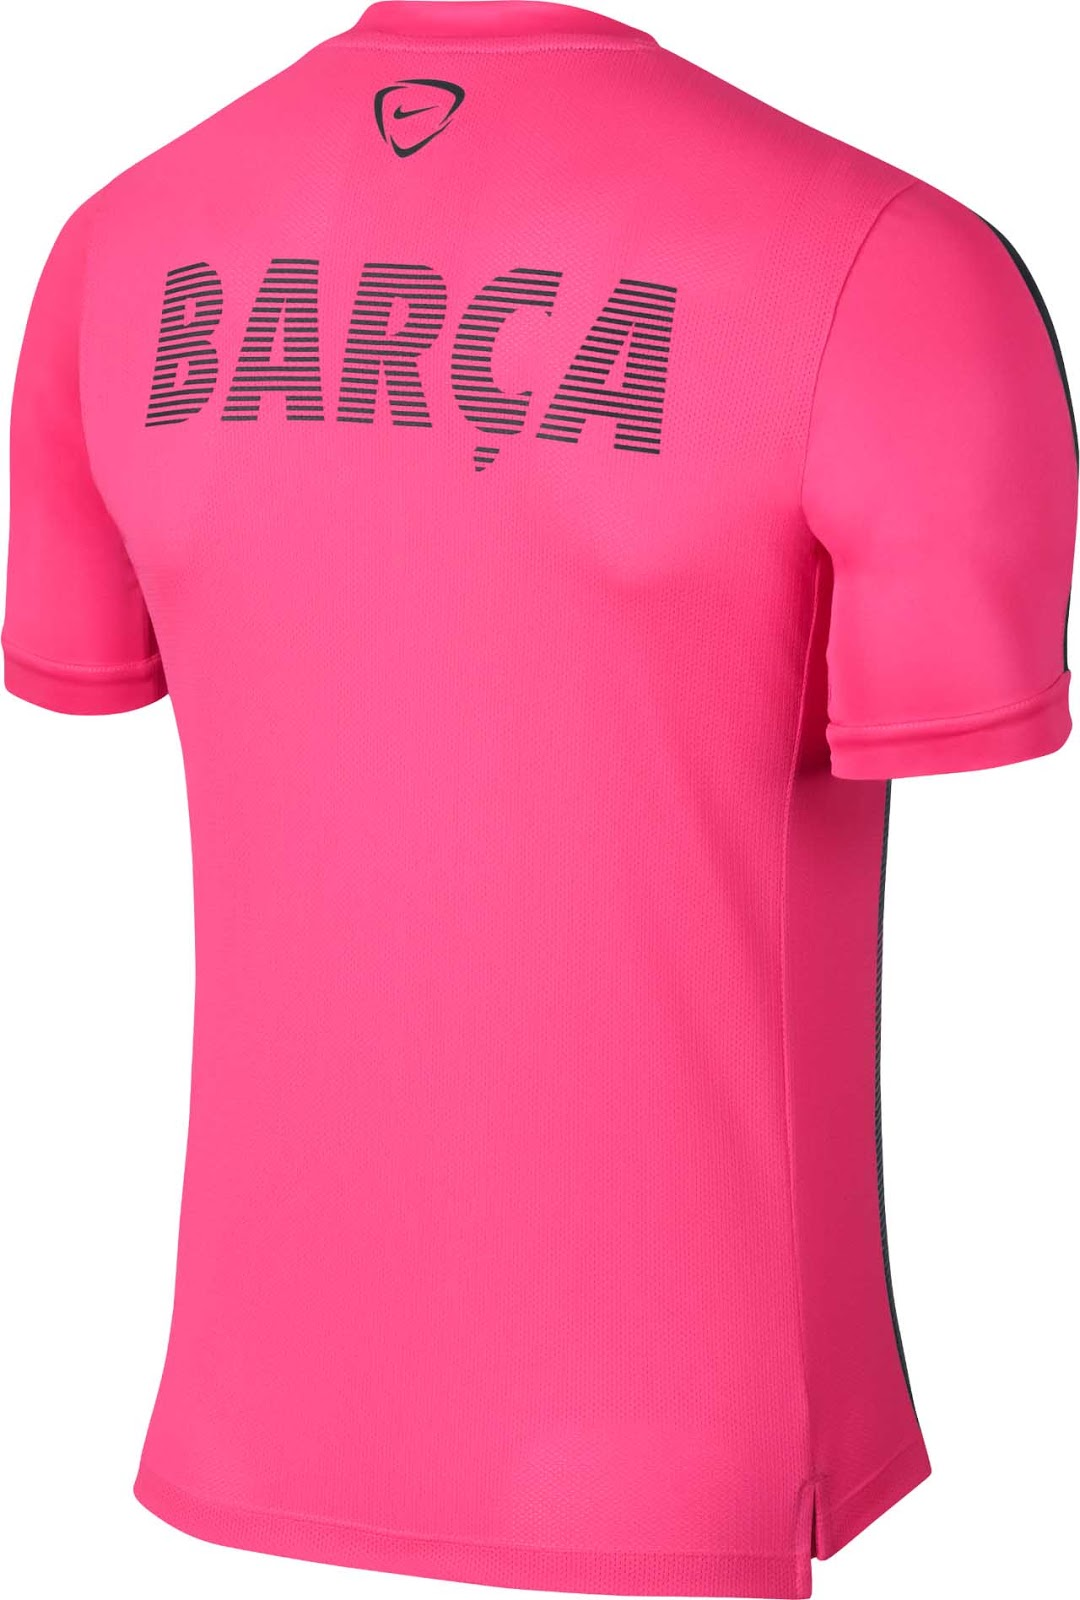 comprar camiseta rosa fc barcelona niño